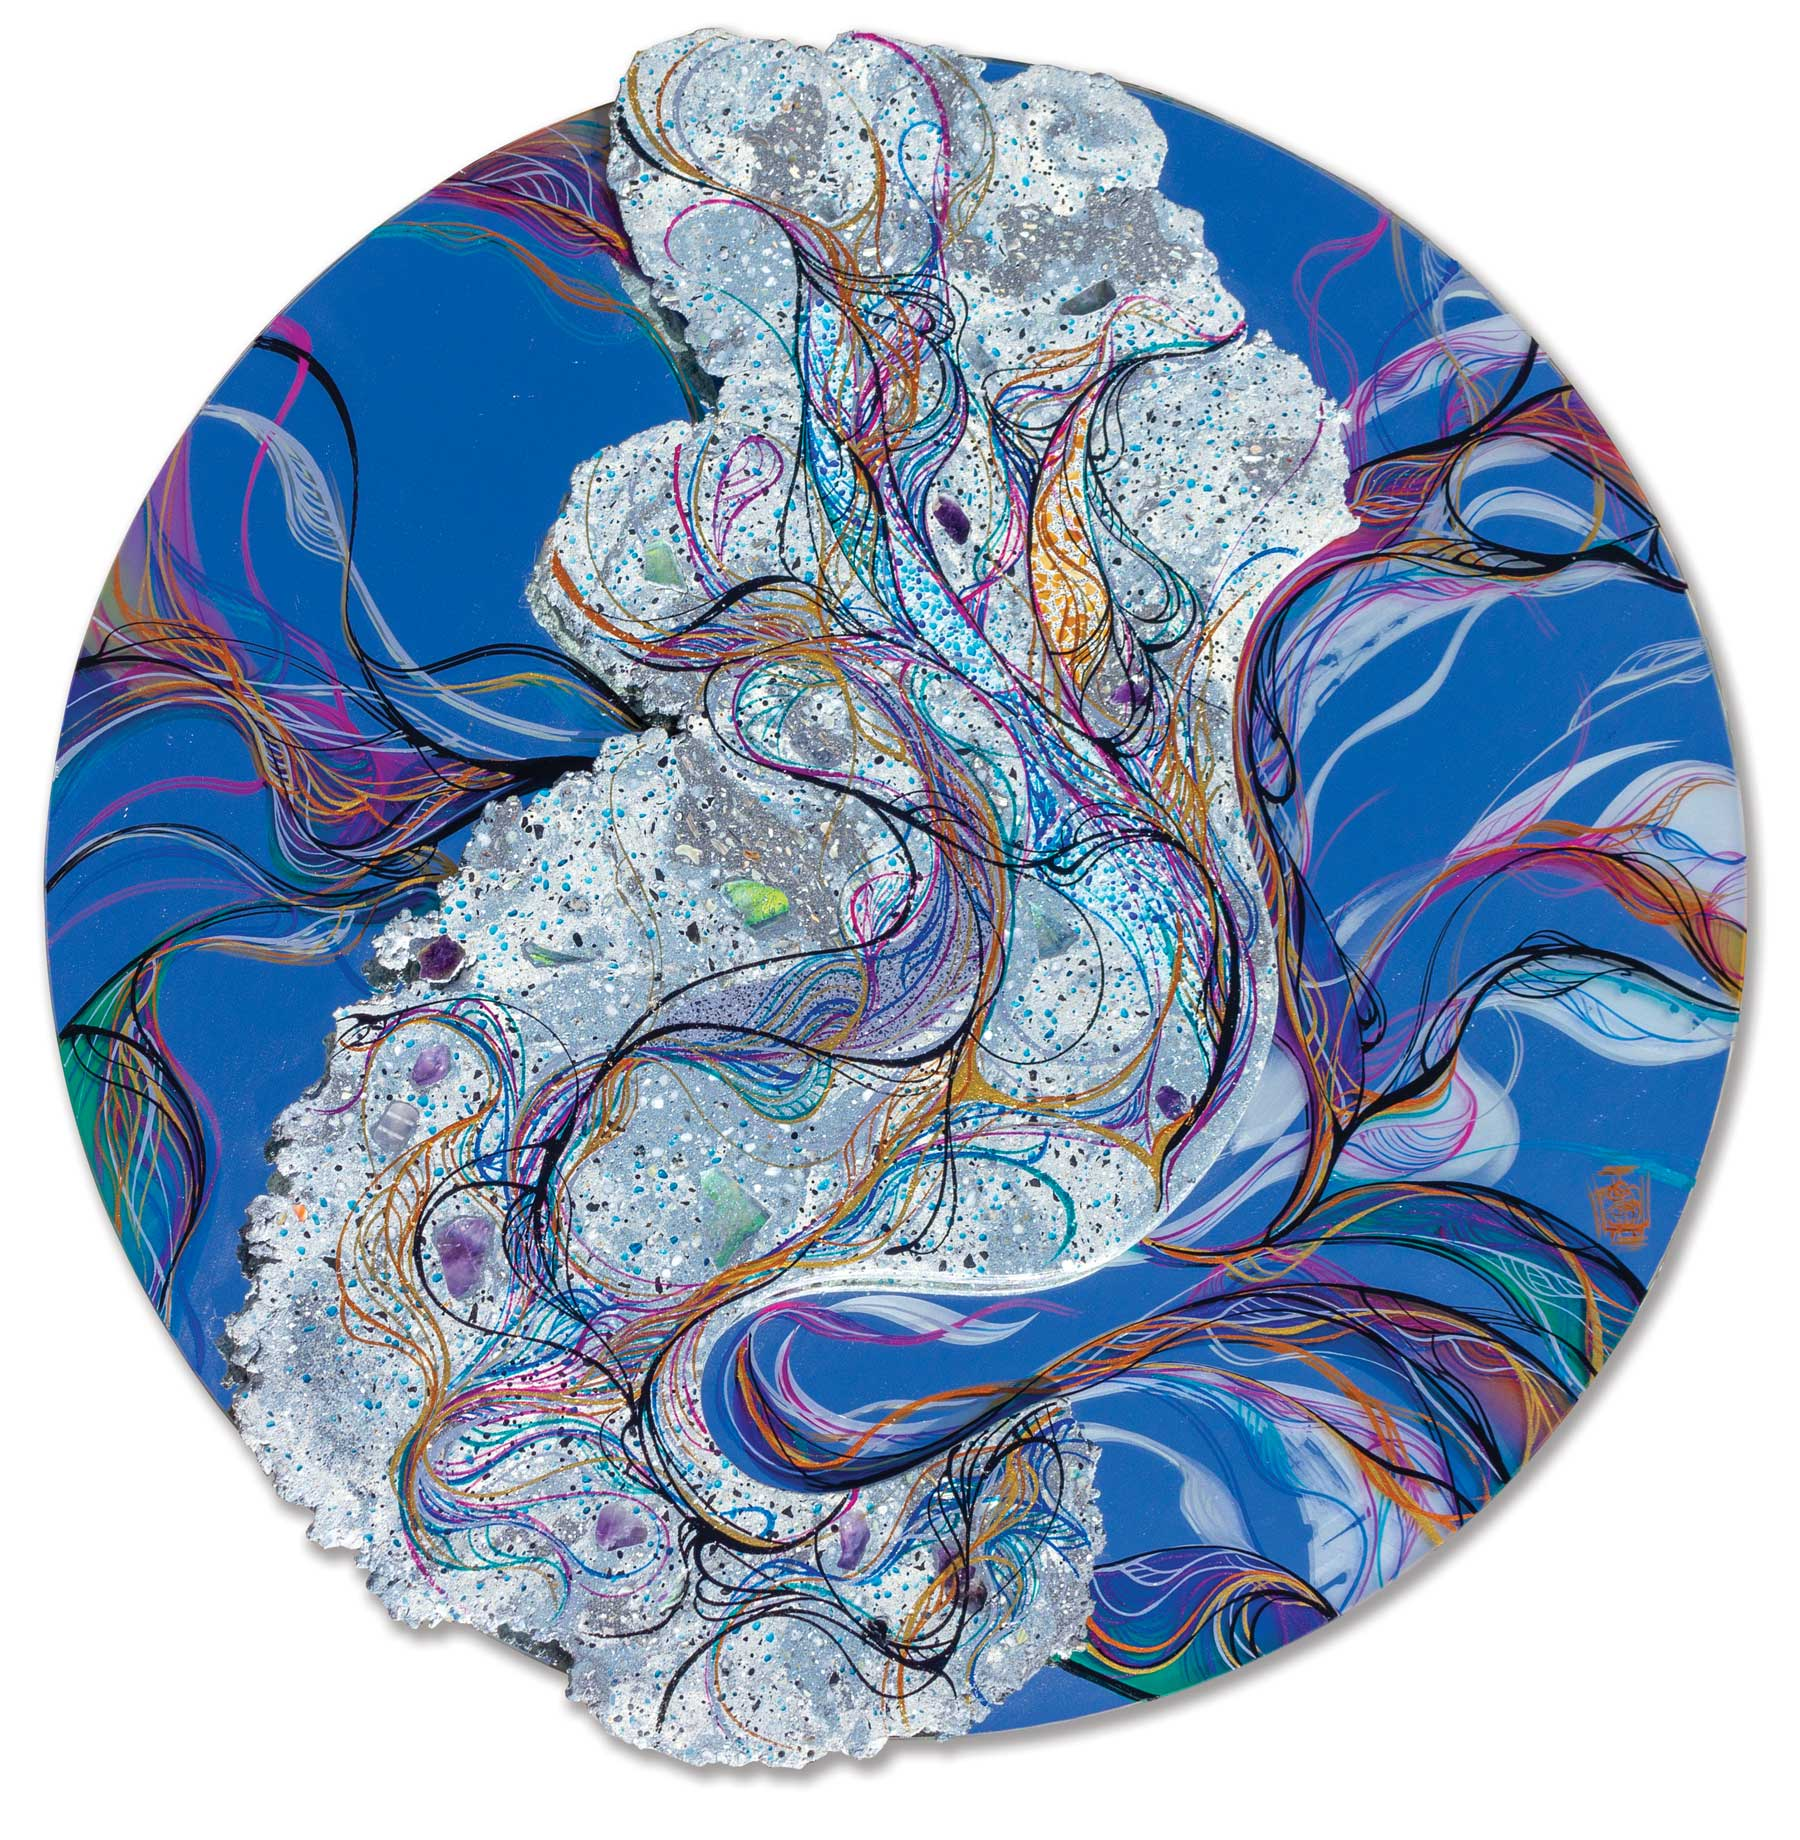 Maelstrom By Ilia Chidzey White